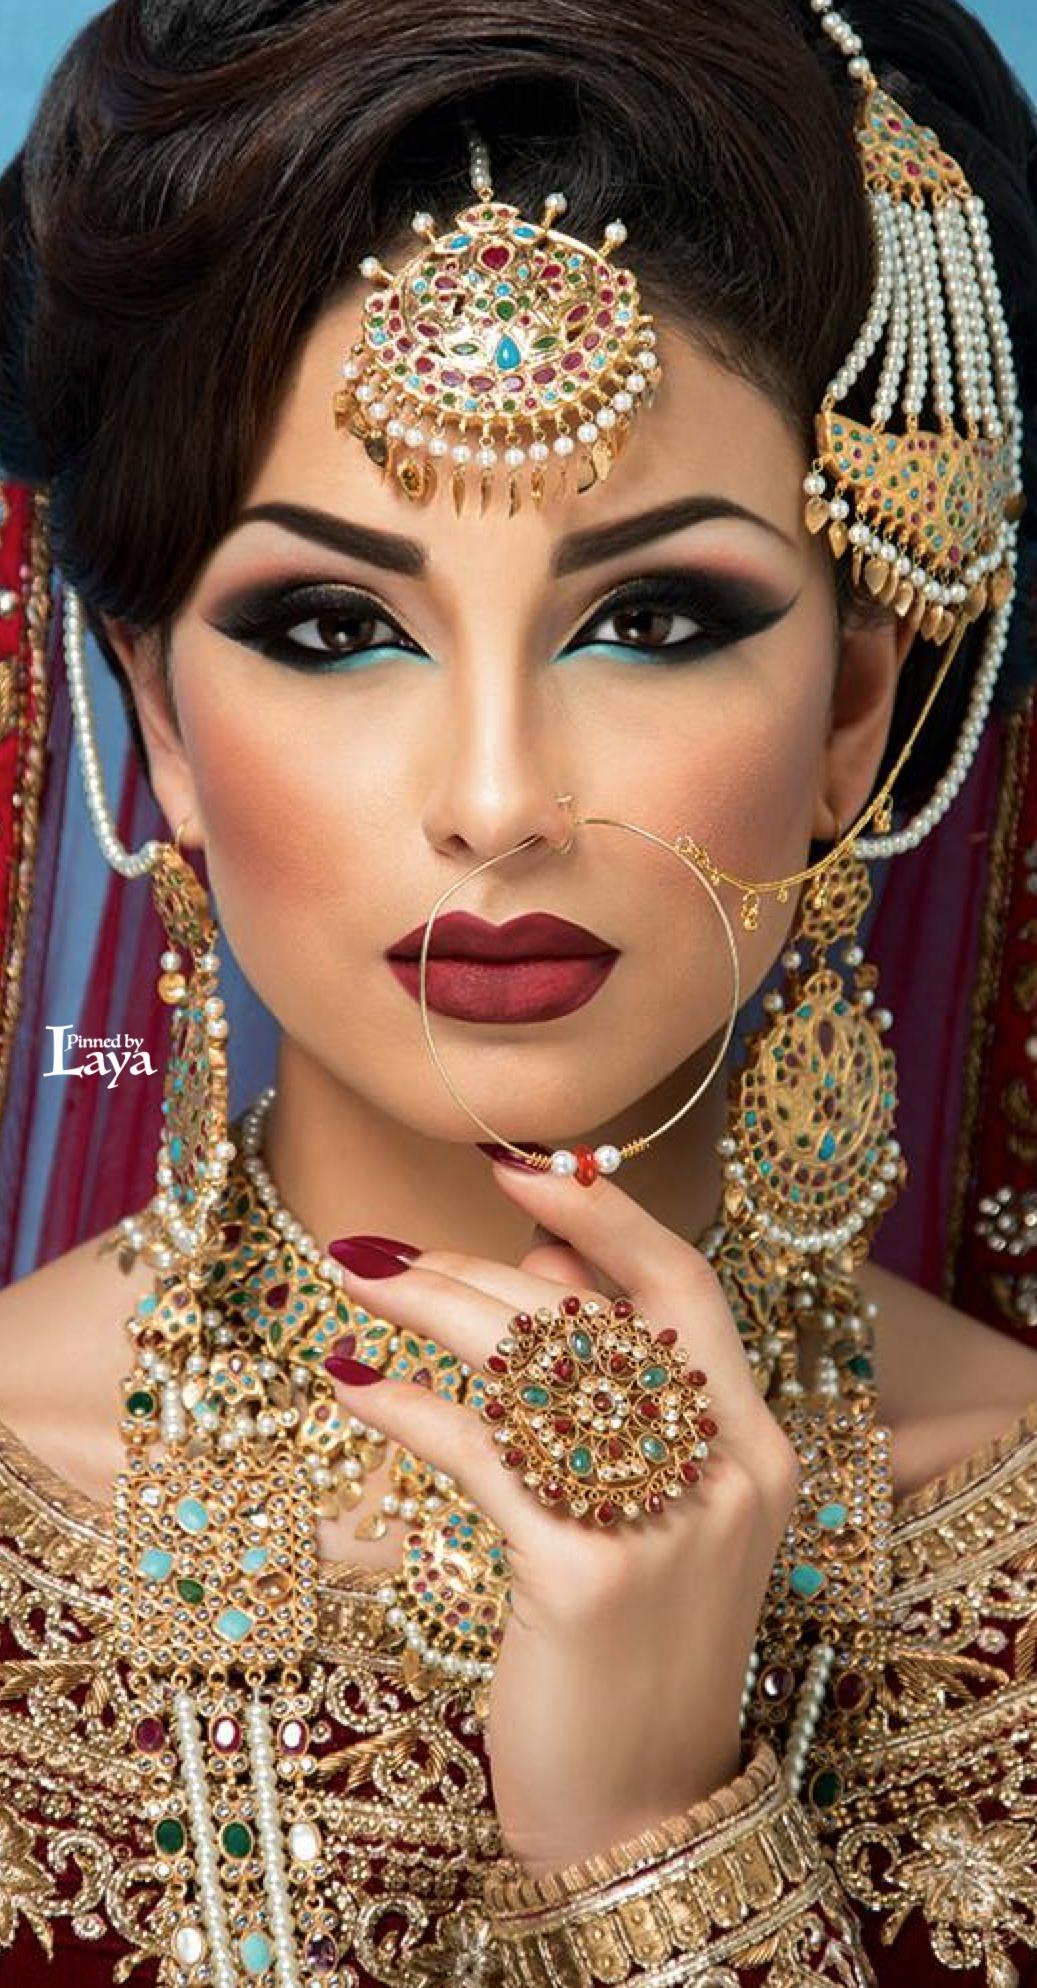 Pin By Label Shrena Hirawat On Beauty, Hair, Makeup   Indian Bridal regarding Bridal Makeup Pictures Facebook